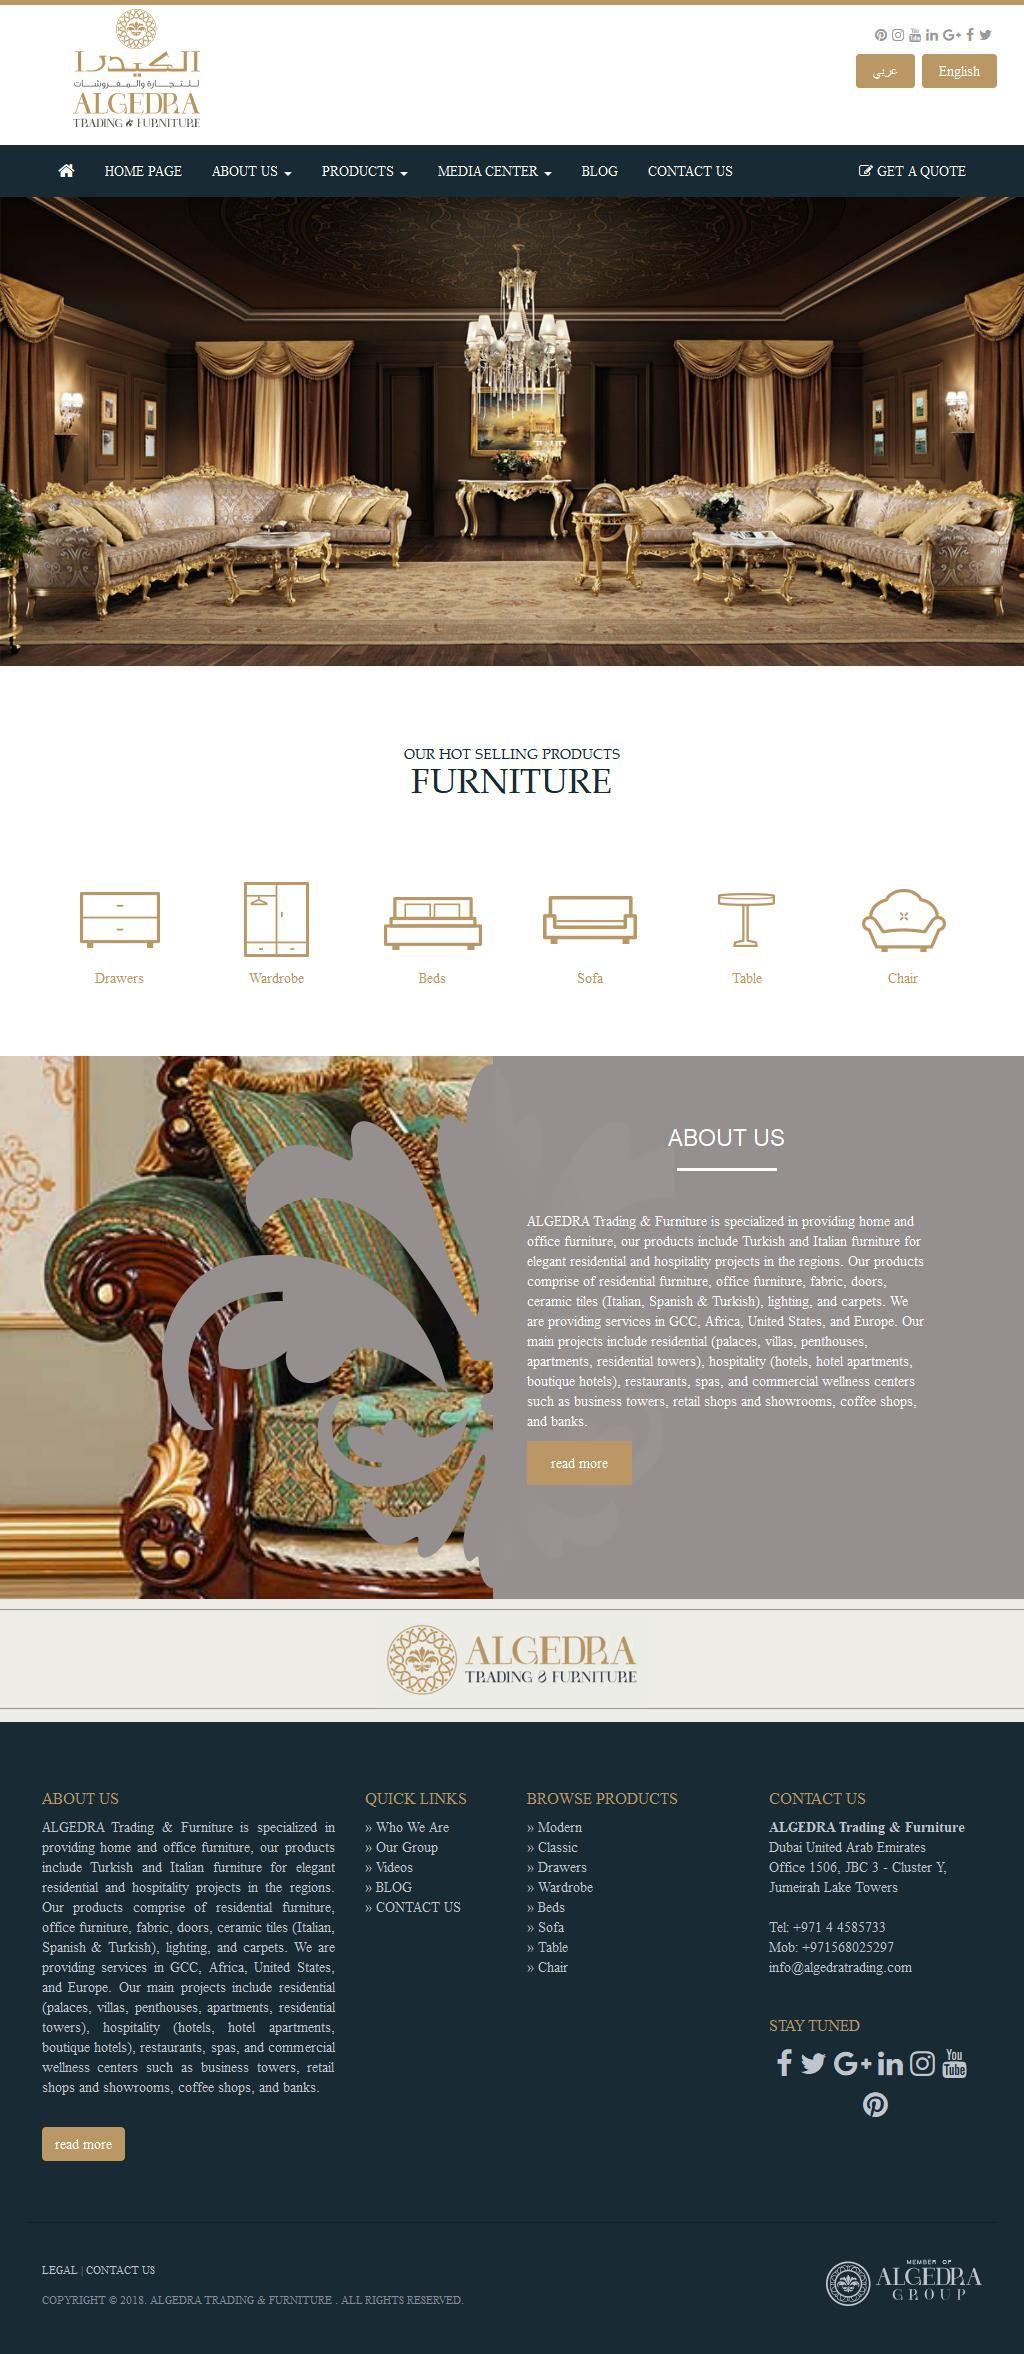 Algedra Trading Furniture Company Jumeirah Business Centre